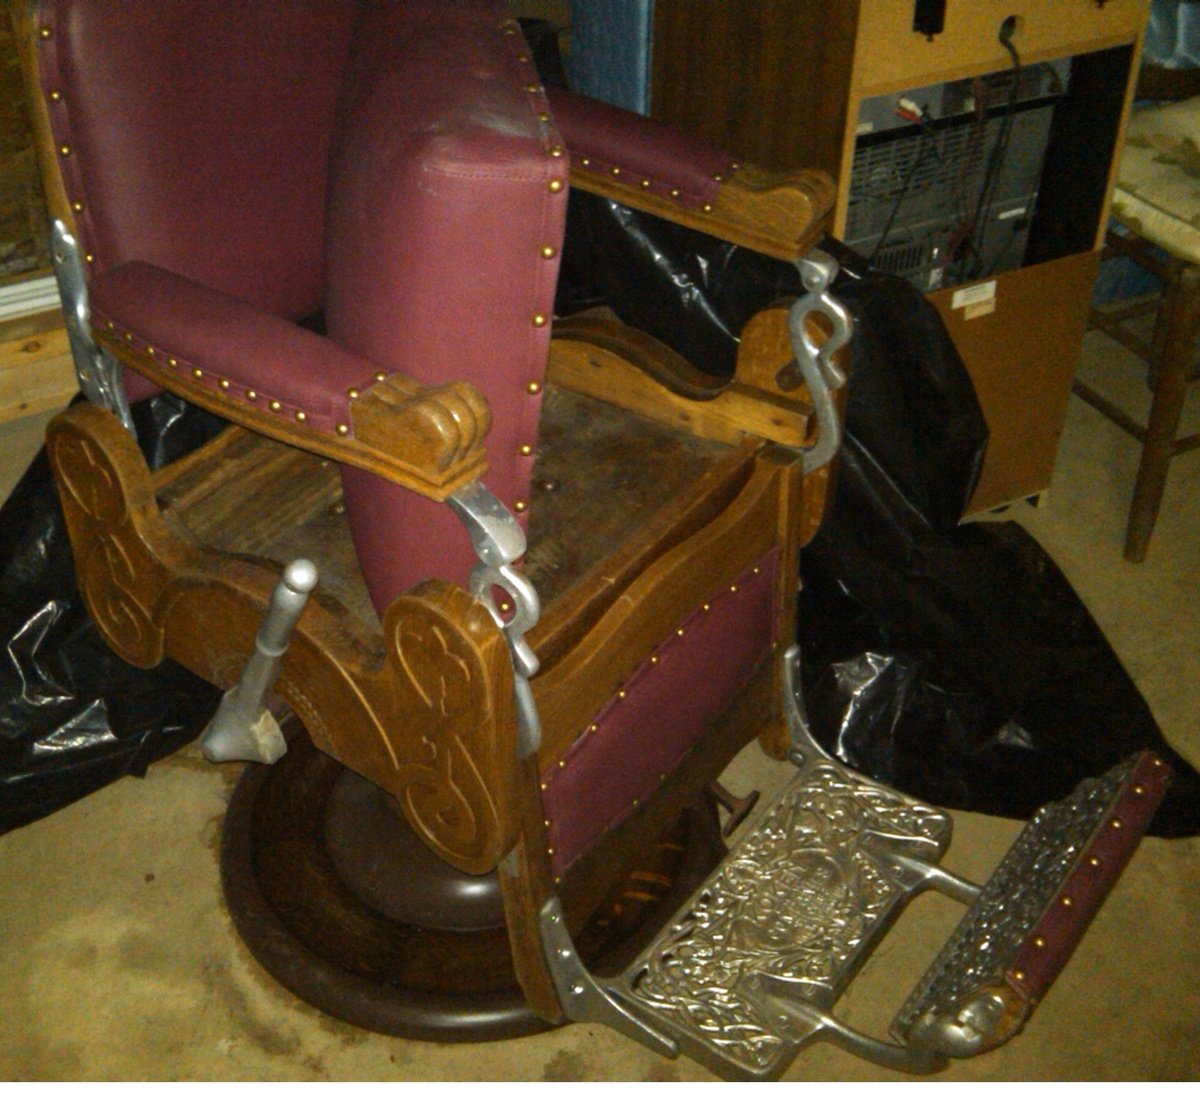 koken barber p chair chairs